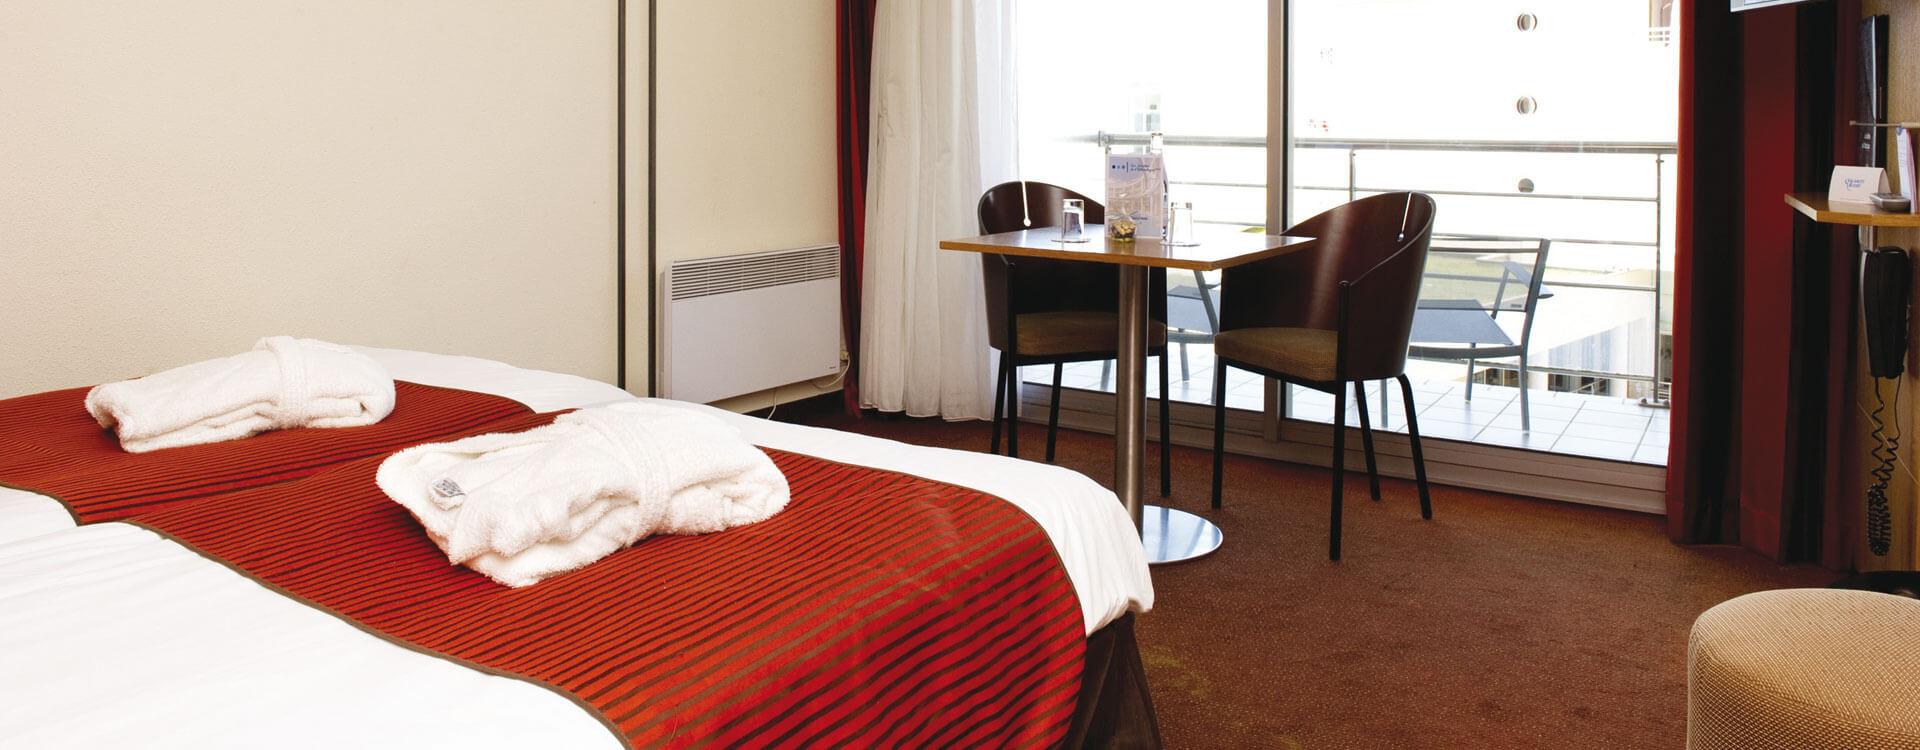 Chambres triples - Hôtel *** Les Jardins de l'Atlantique